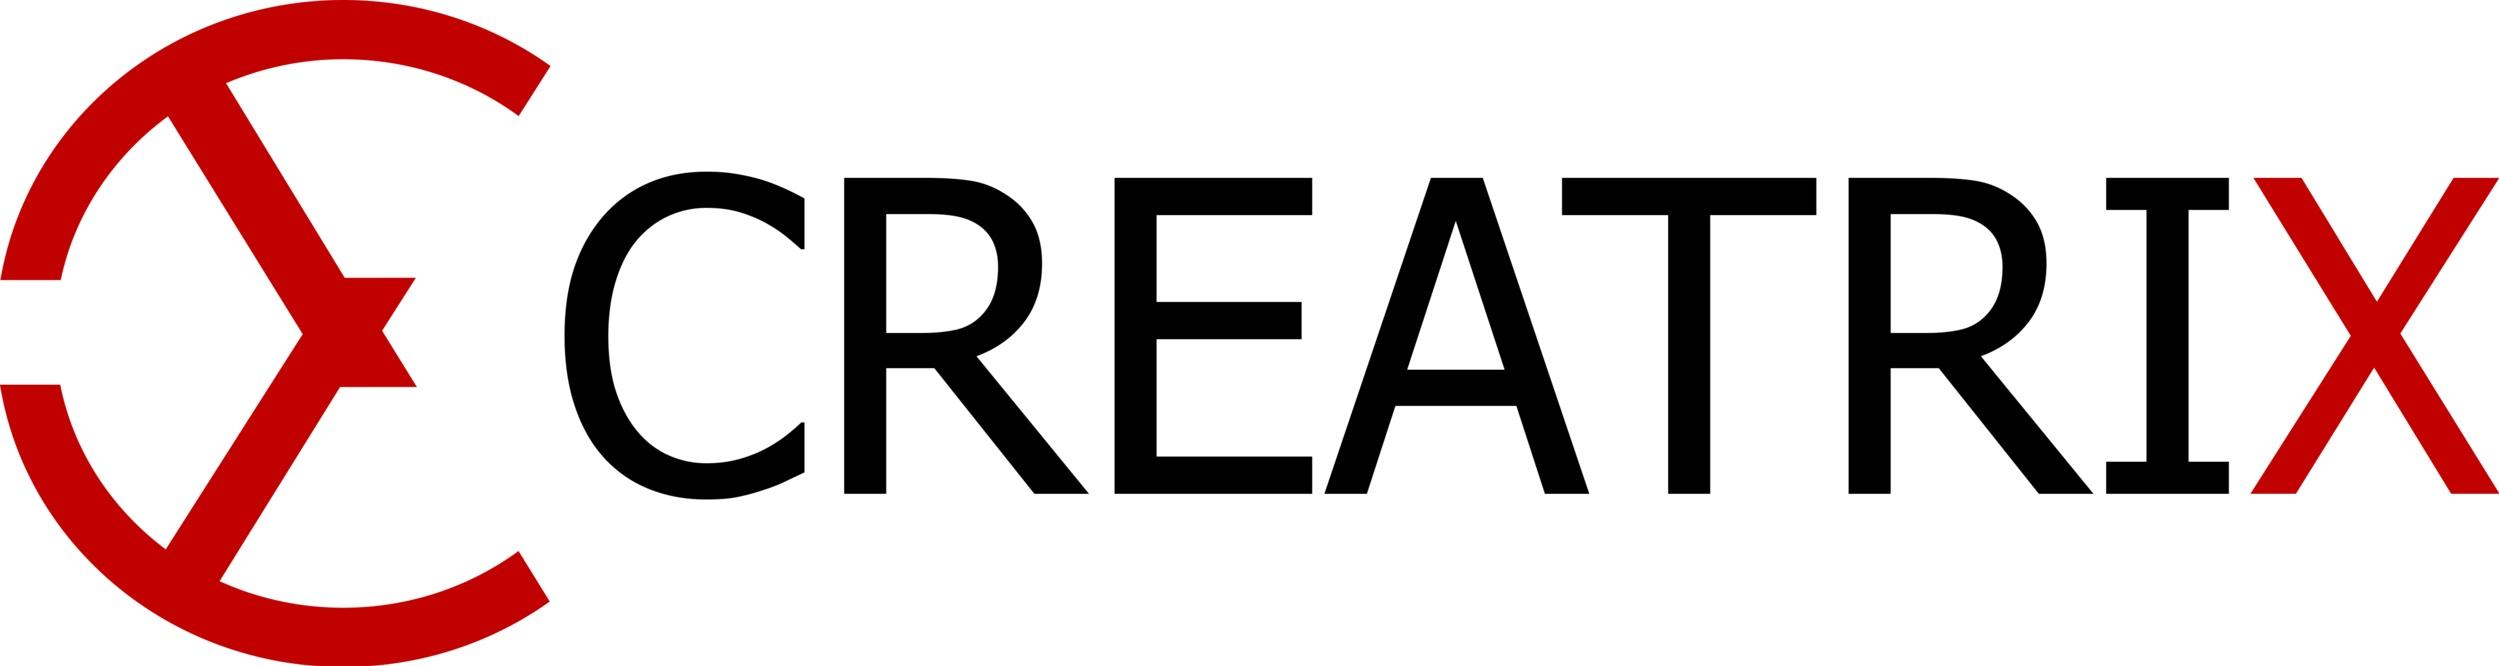 creatrix_large_logo.jpg